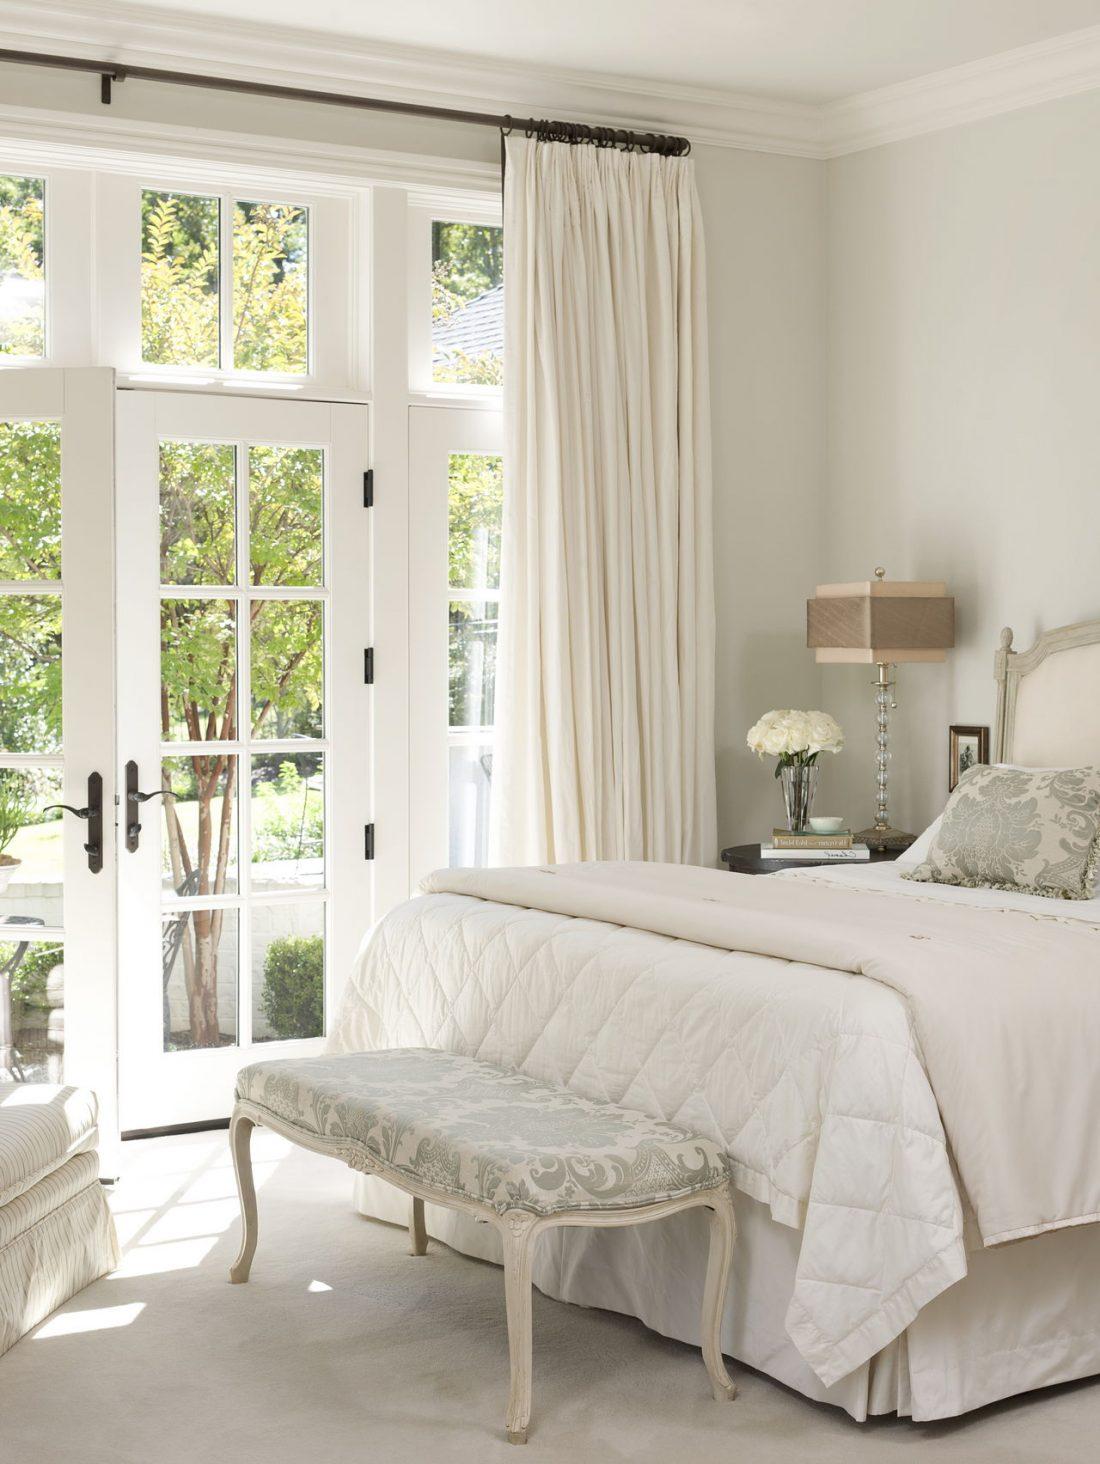 Спальня в стиле прованс 4